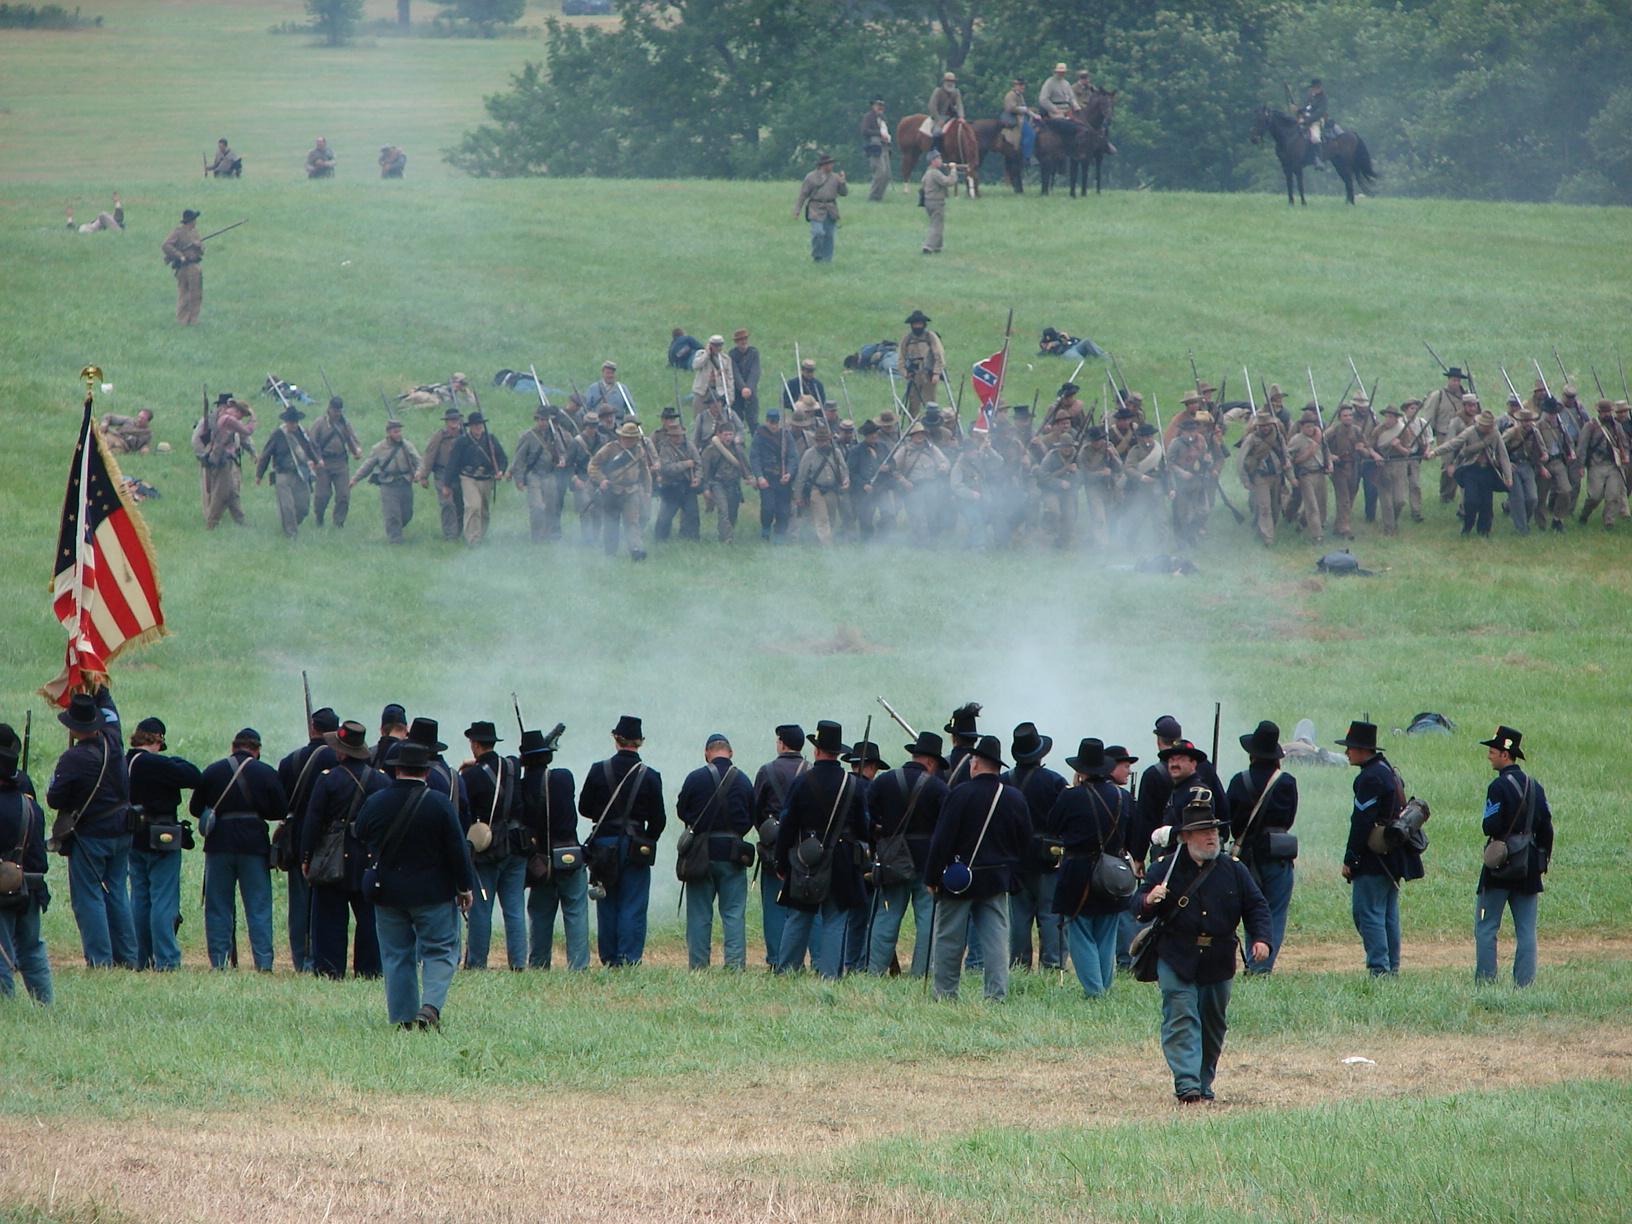 gettysburg 98 high resolution HD Wallpaper   General 369575 1632x1224